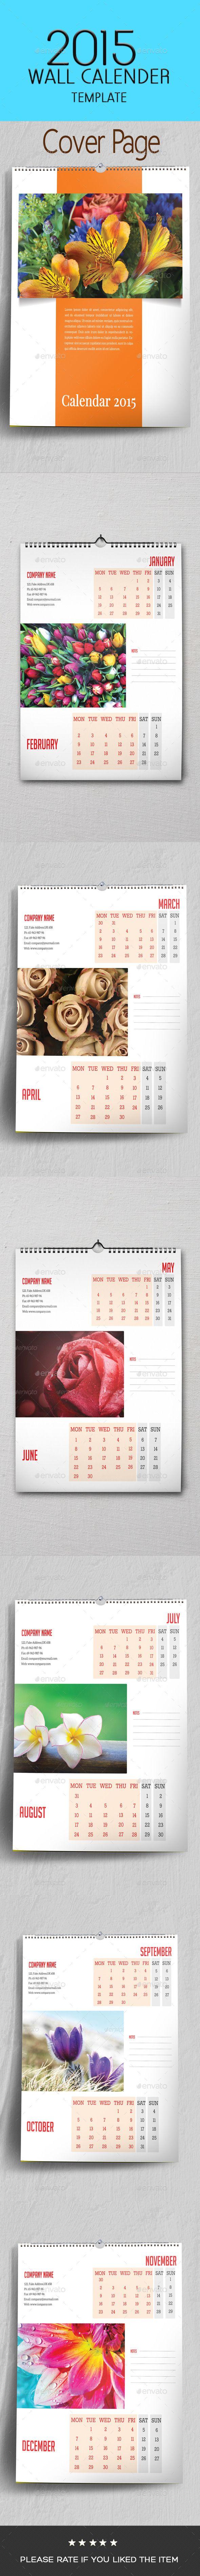 2015 Multipurpose Wall Calendar Template - Calendars Stationery